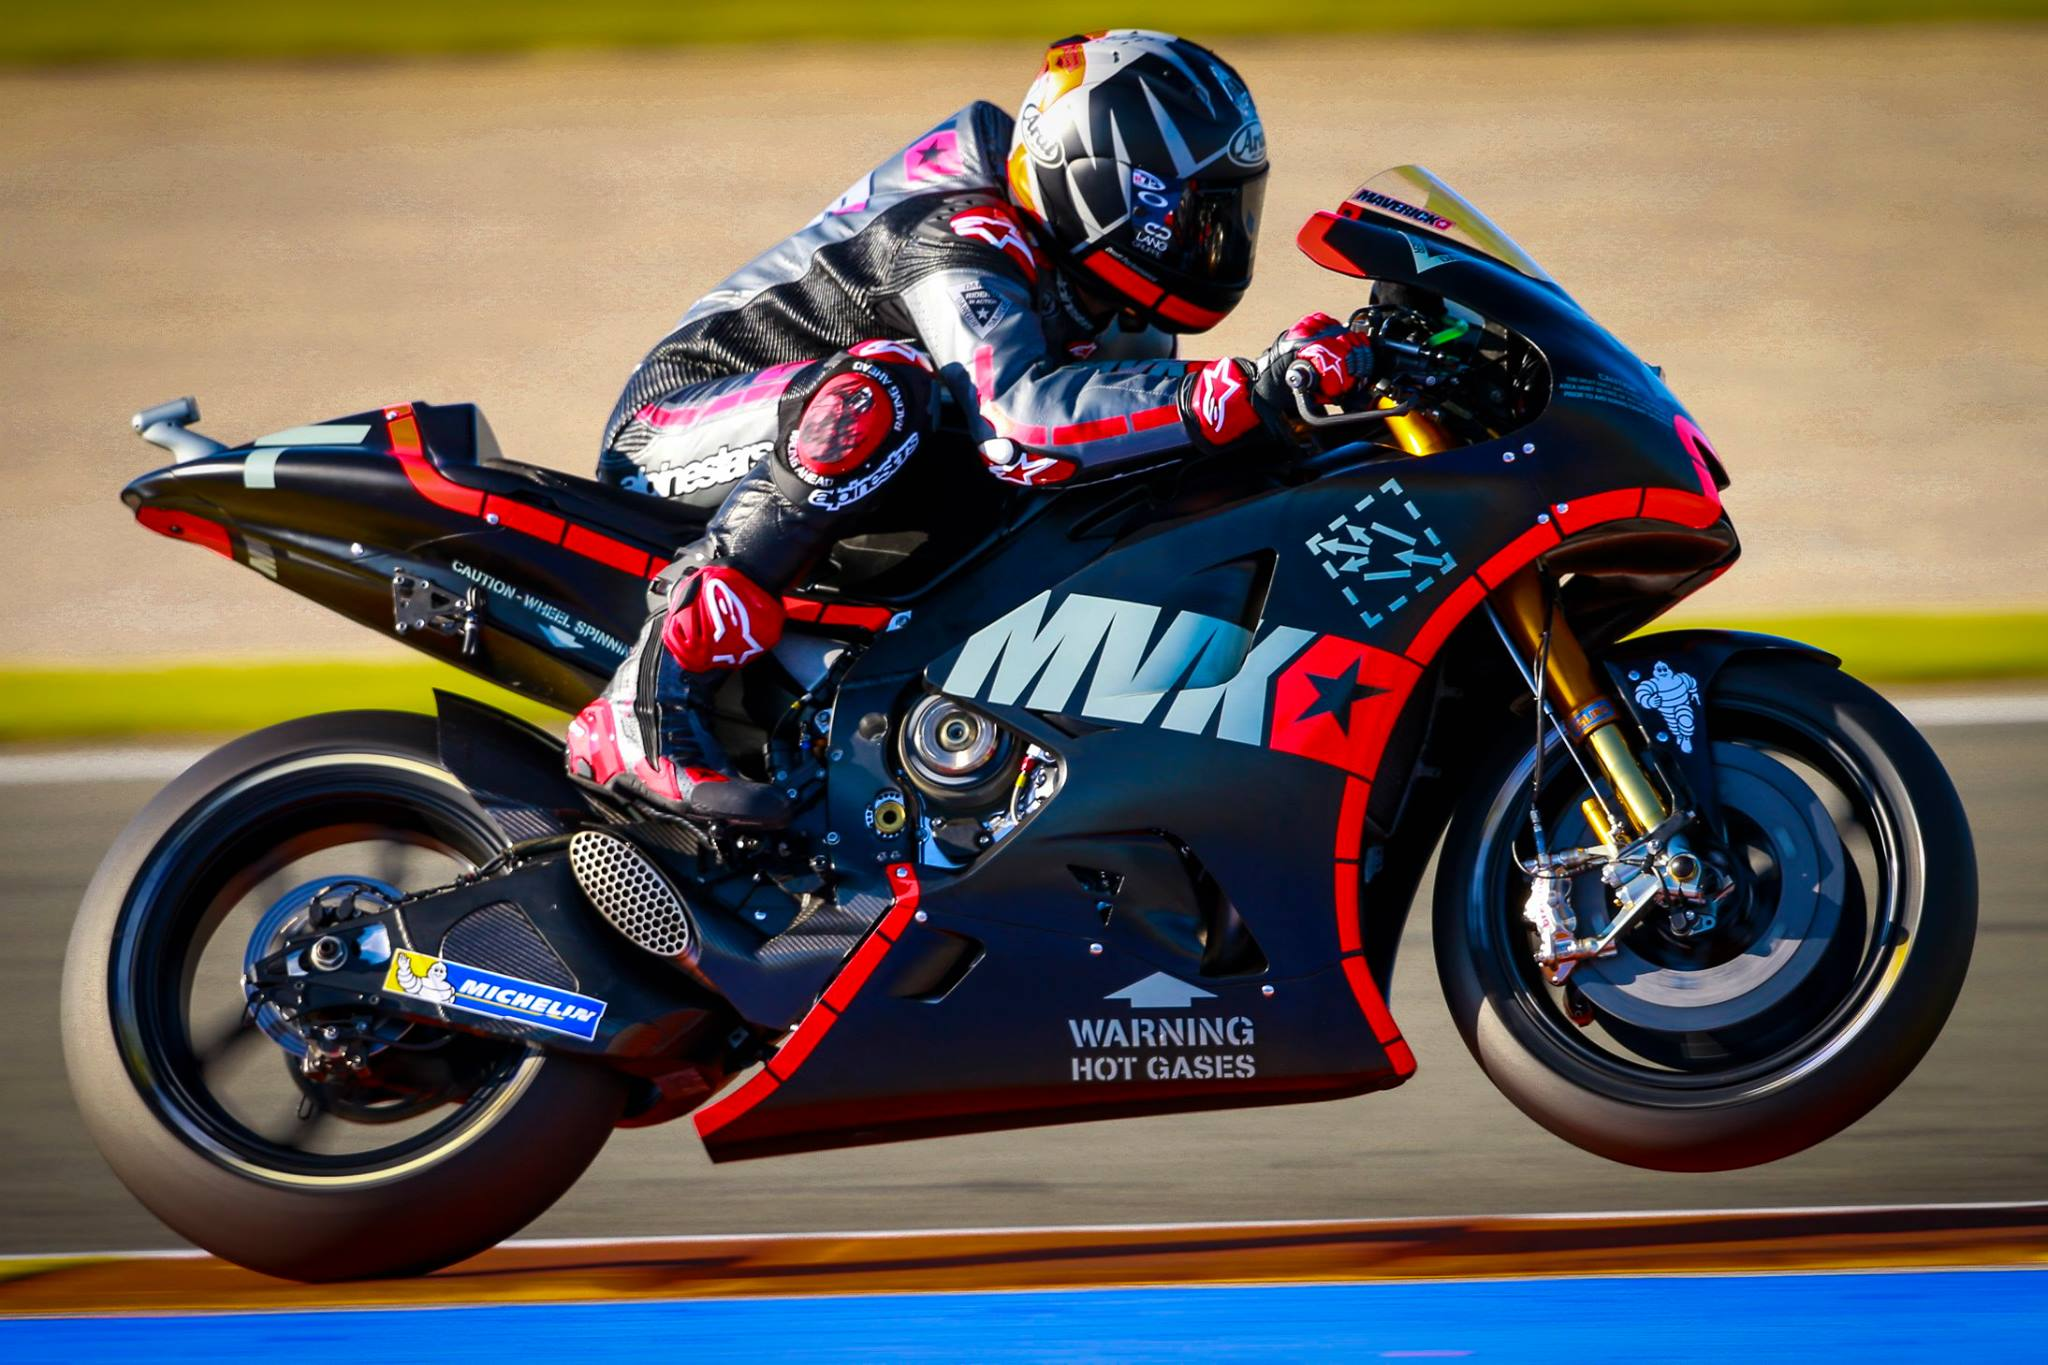 MotoGP 2017... - Page 2 4492801502511311976345803128122781957146994876704o